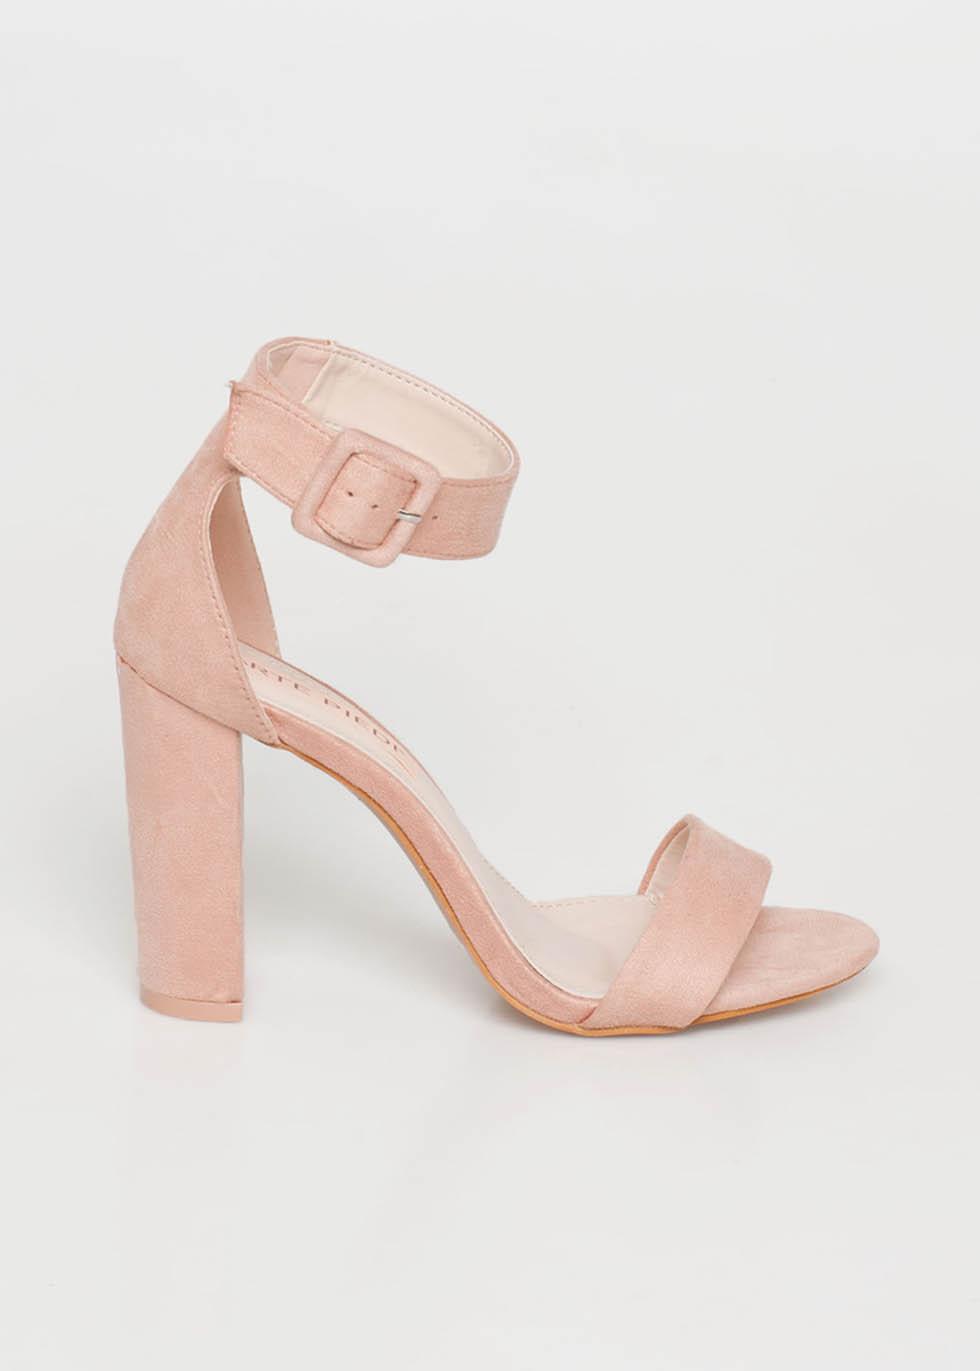 Cora suede πέδιλο, baby pink παπούτσια